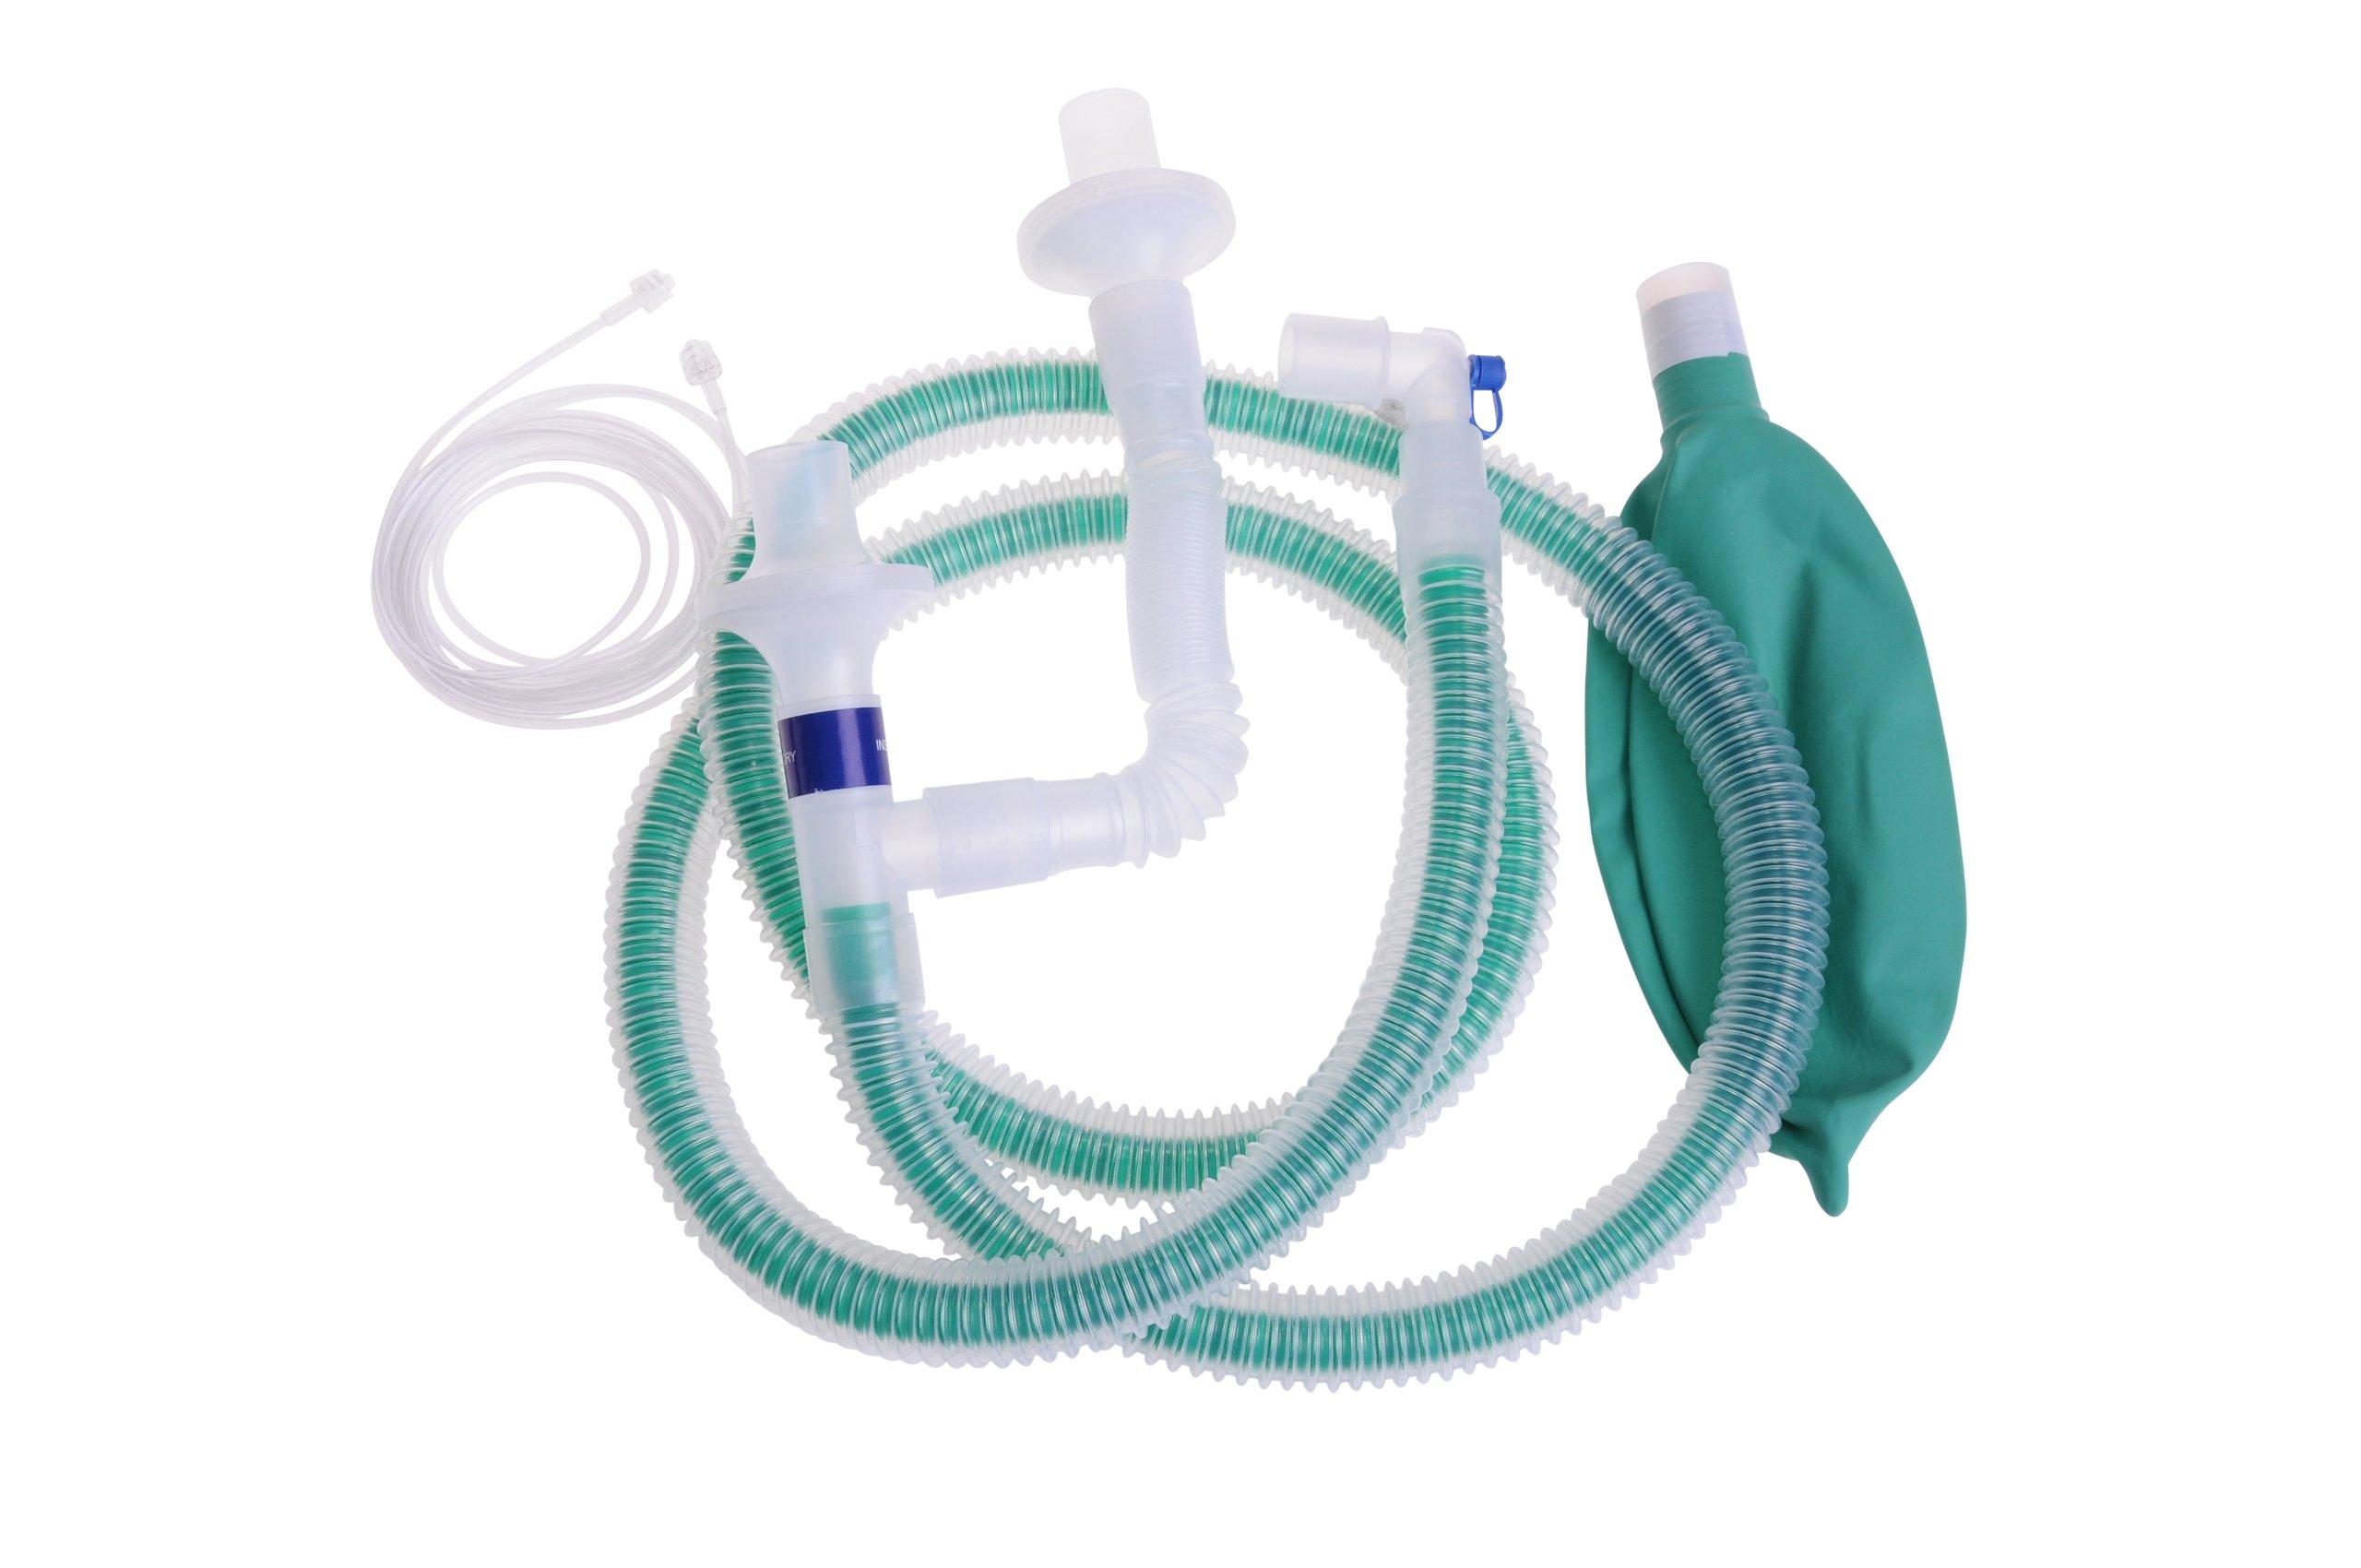 Medline DYNJAPF6030 Pediatric 72'' Unilimb Anesthesia Circuit w/Gas Sampling Line (Case of 20) by Medline